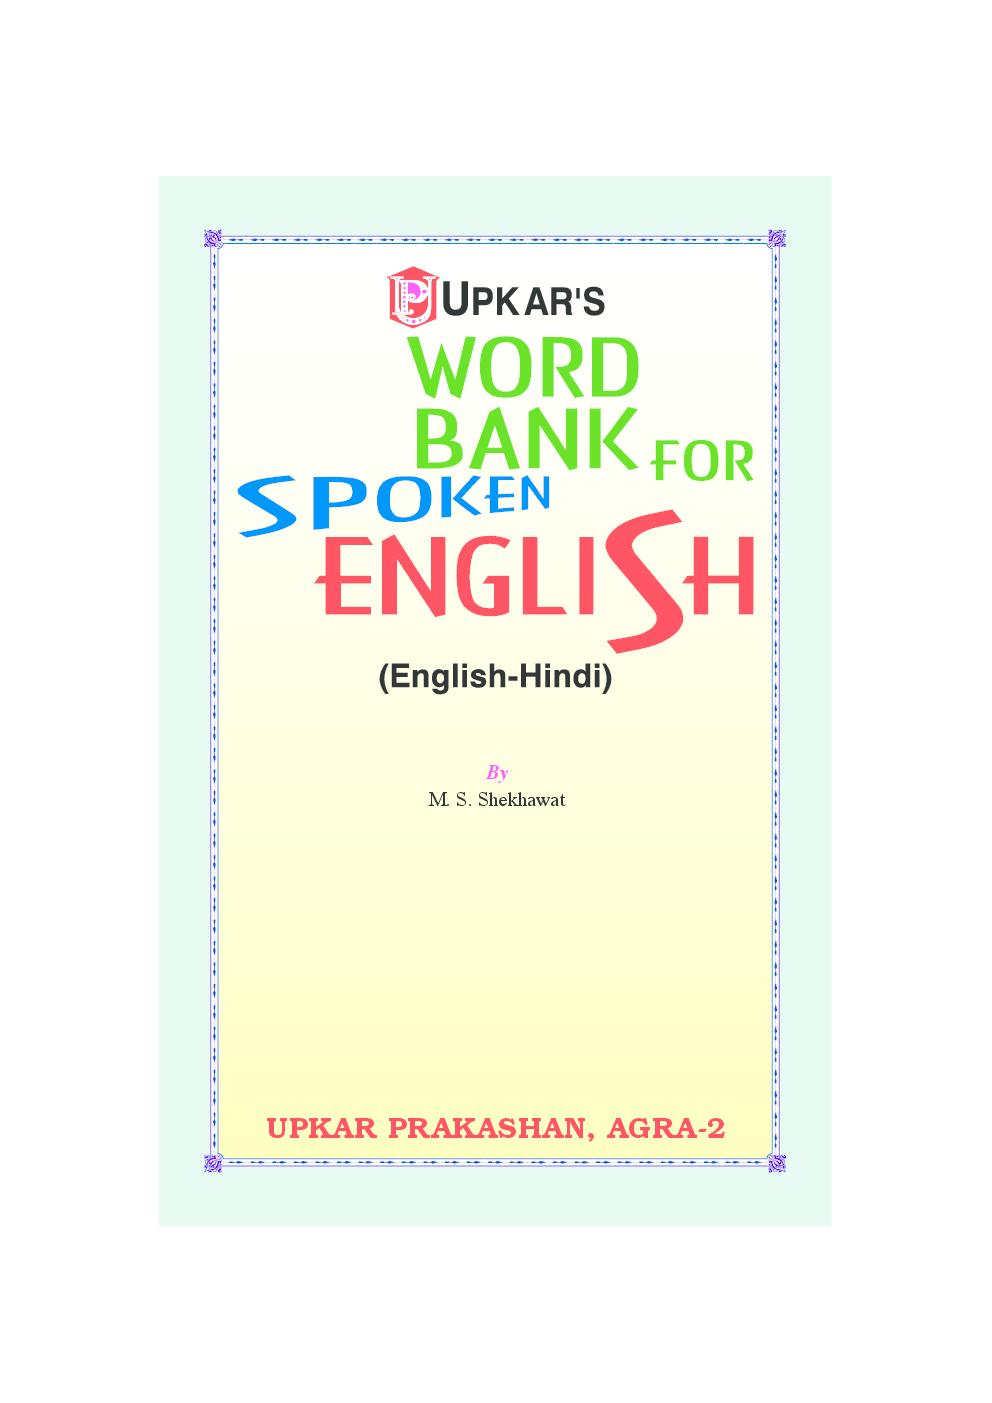 Word Bank for Spoken English (Eng.-Hindi) - Page 2